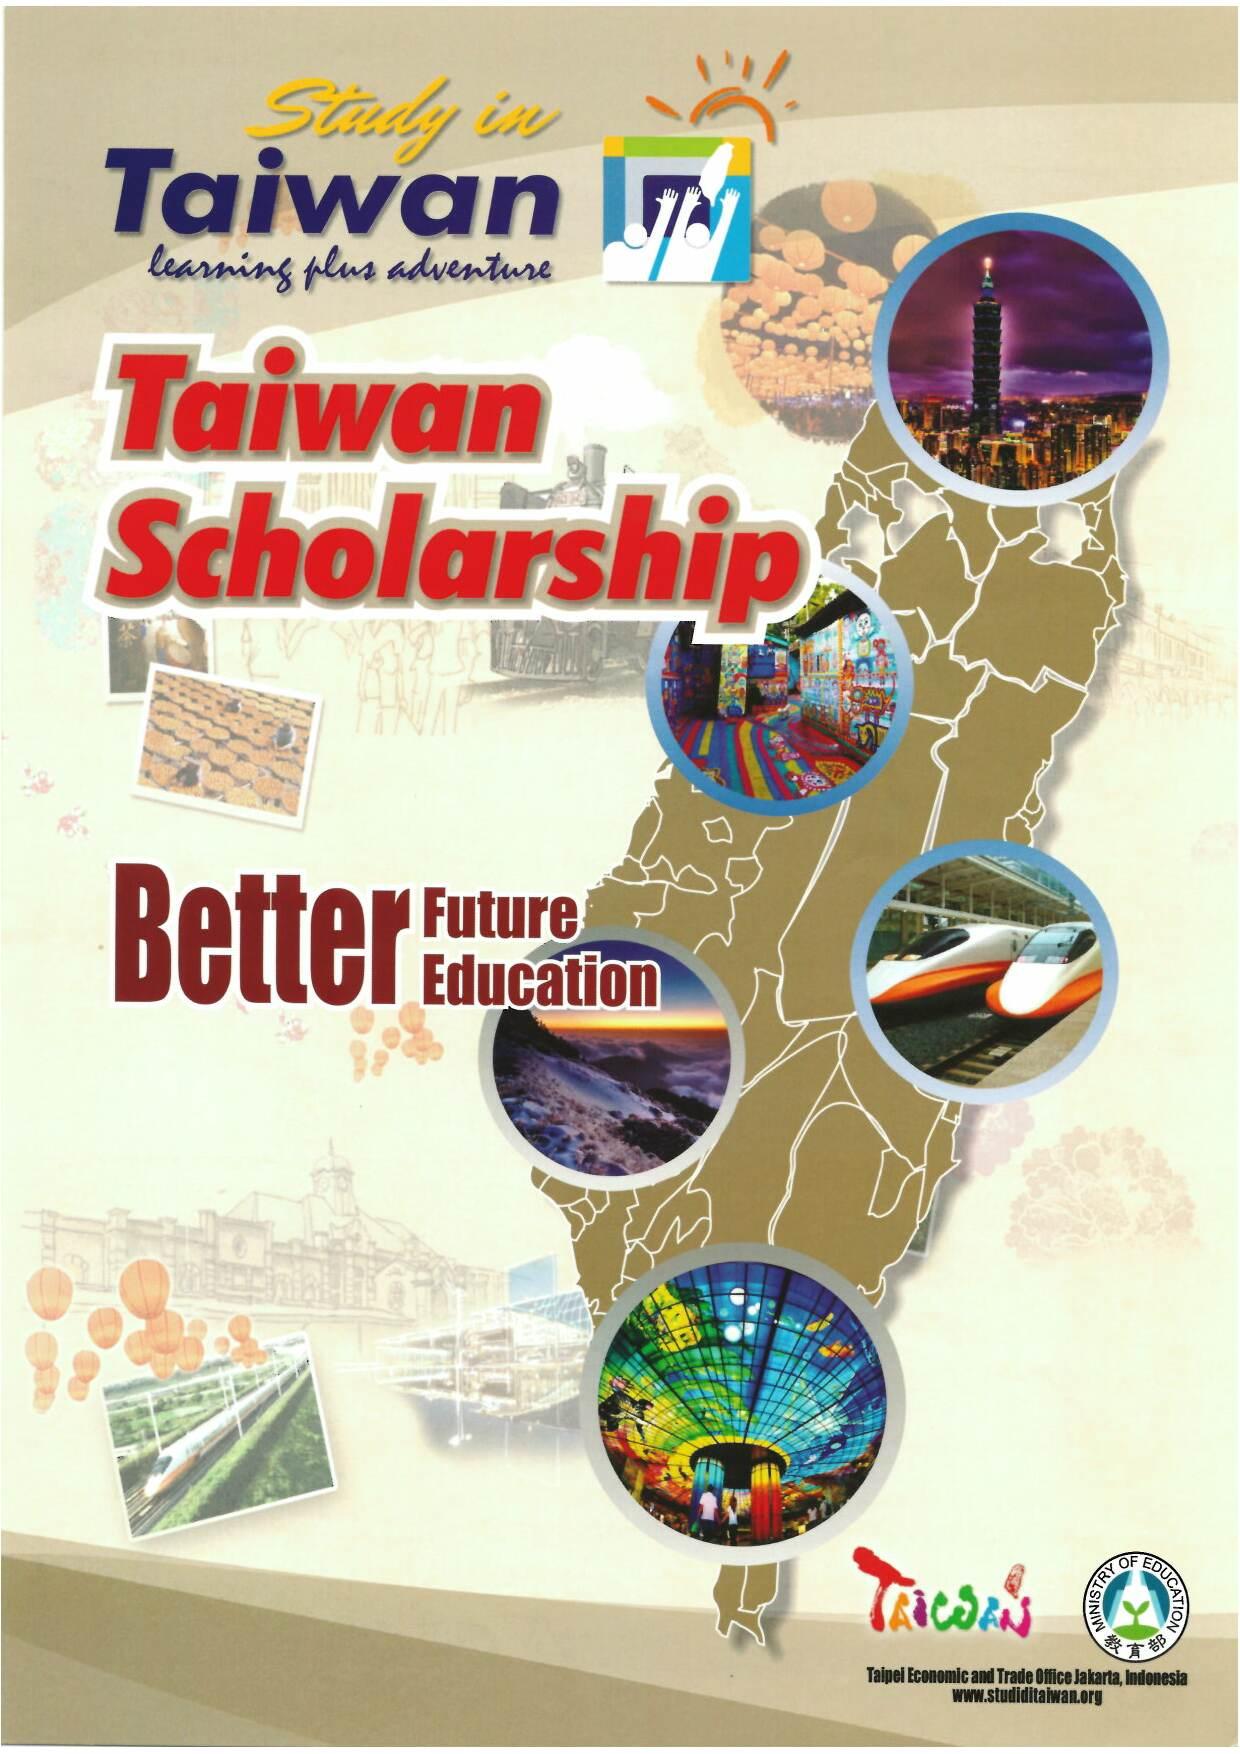 Chinese.binus.ac.id-Beasiswa ke Taiwan(1)